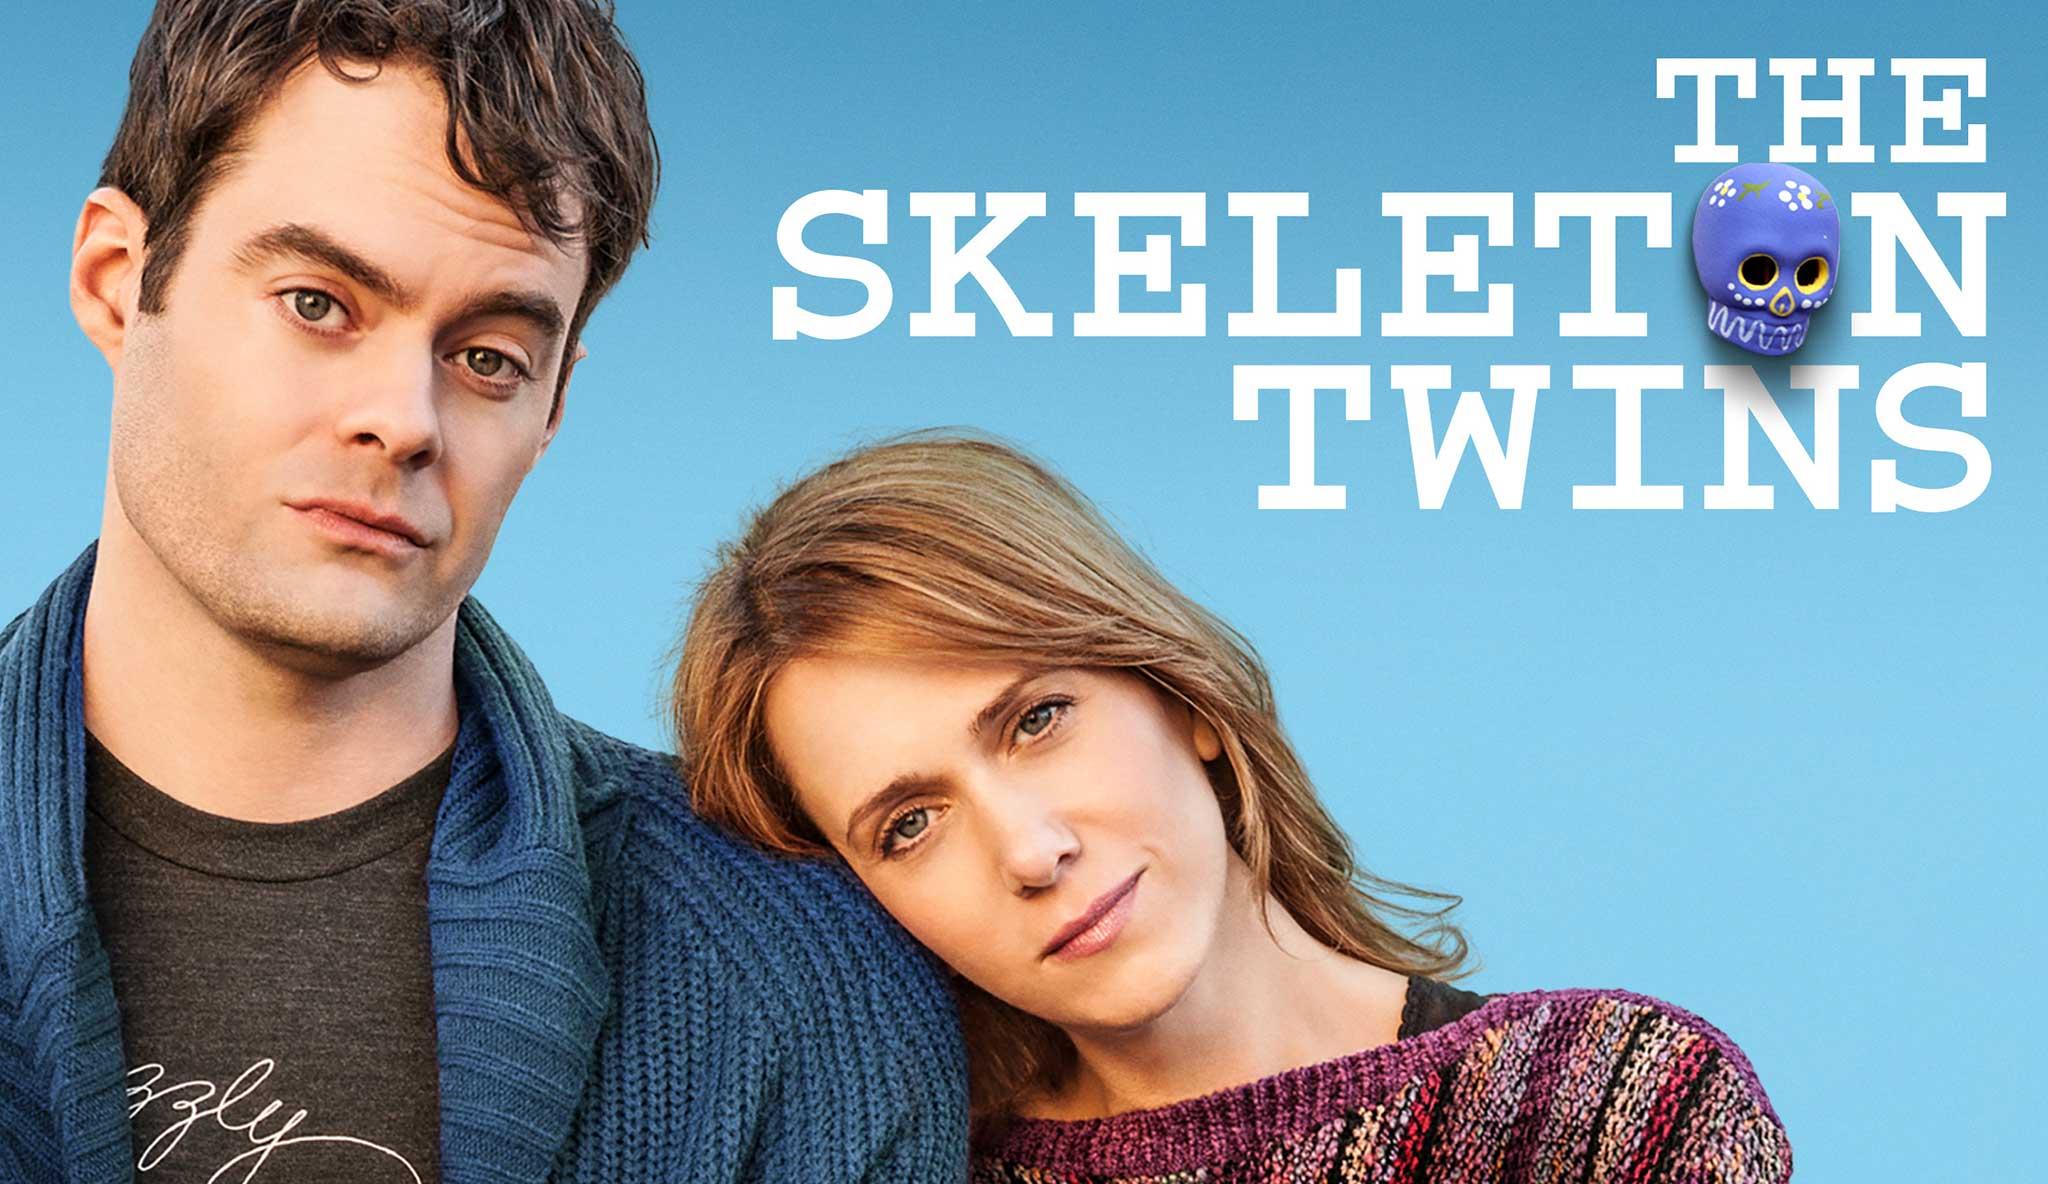 the-skeleton-twins\header.jpg